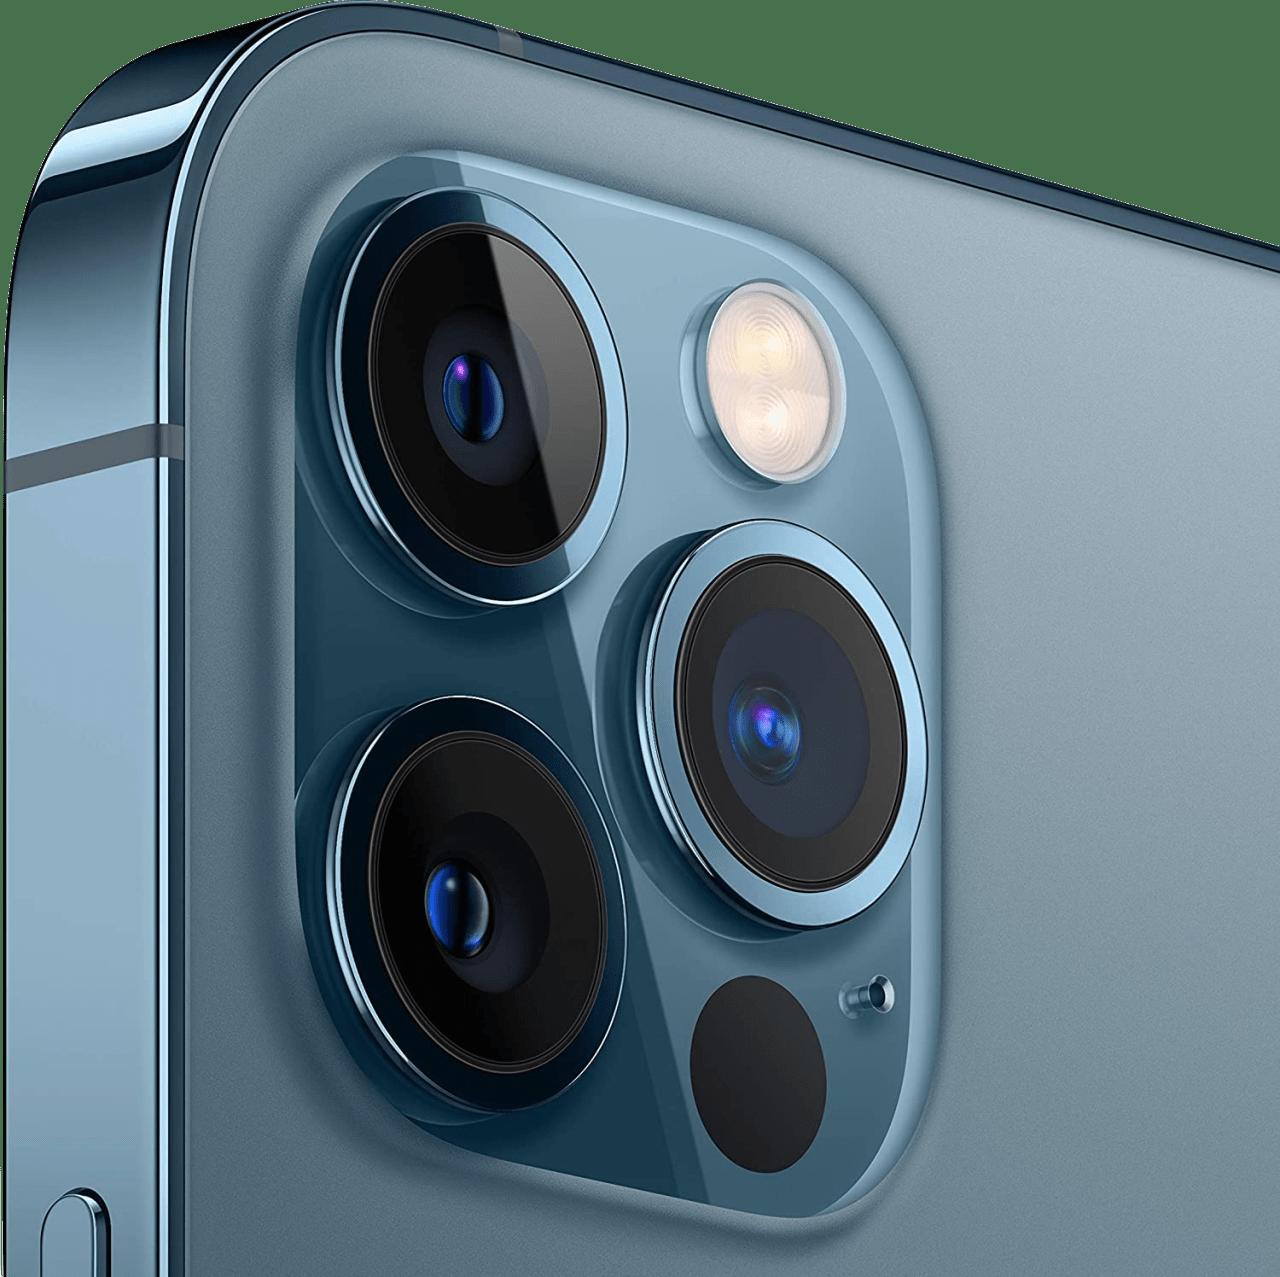 Blau Apple iPhone 12 Pro 512GB.2